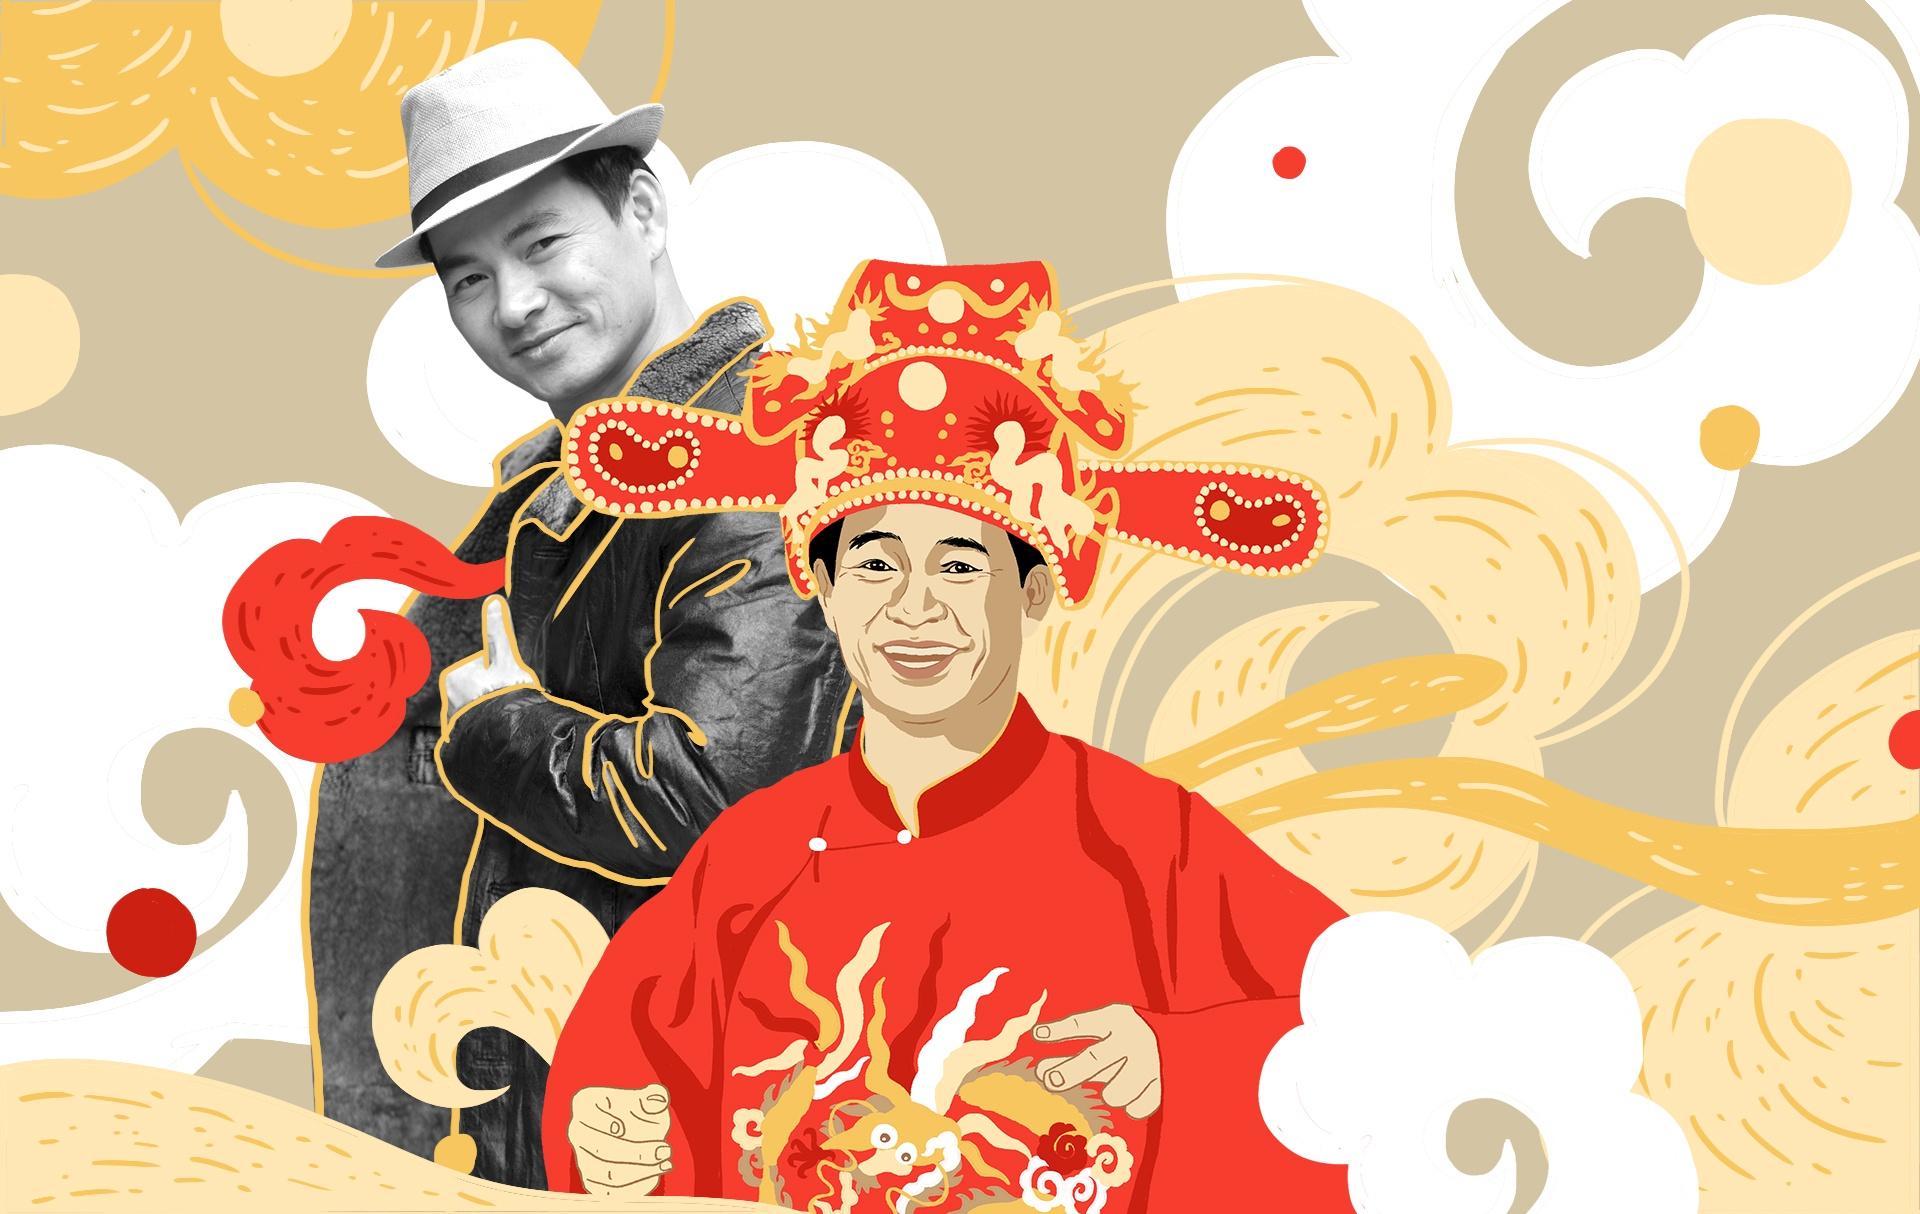 Dang sau su so vo cua 'Nam Tao' Xuan Bac hinh anh 2